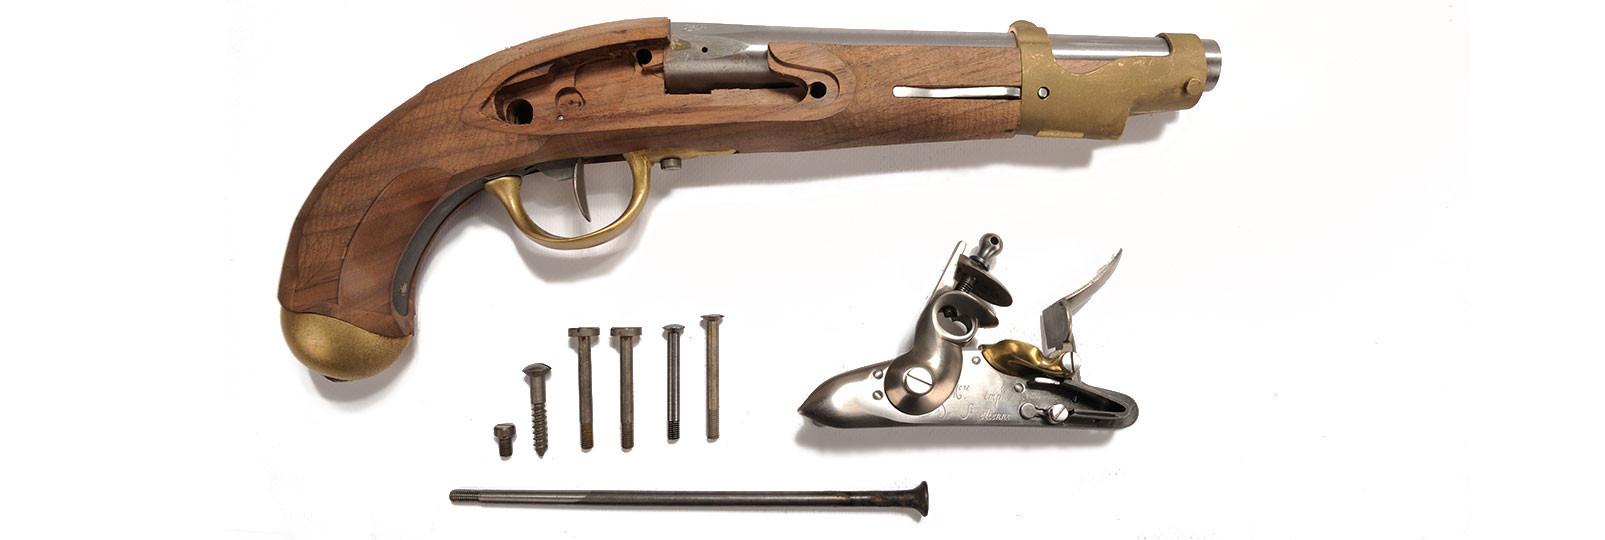 Kit pistola An IX